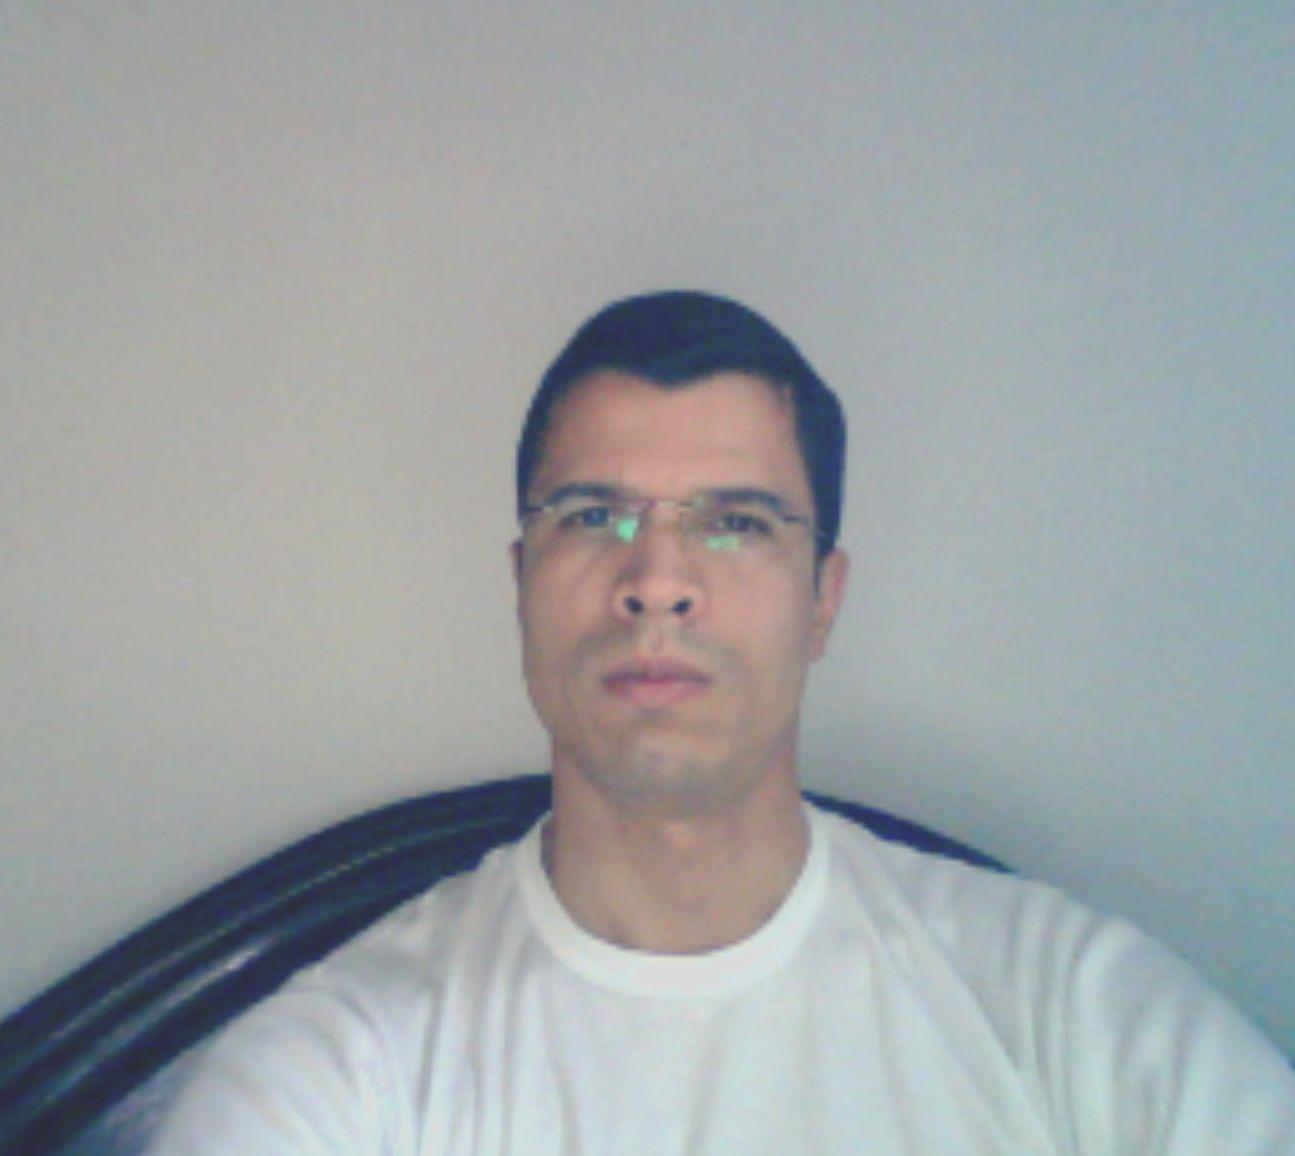 Mauroleon, Hombre de Medellin buscando amigos